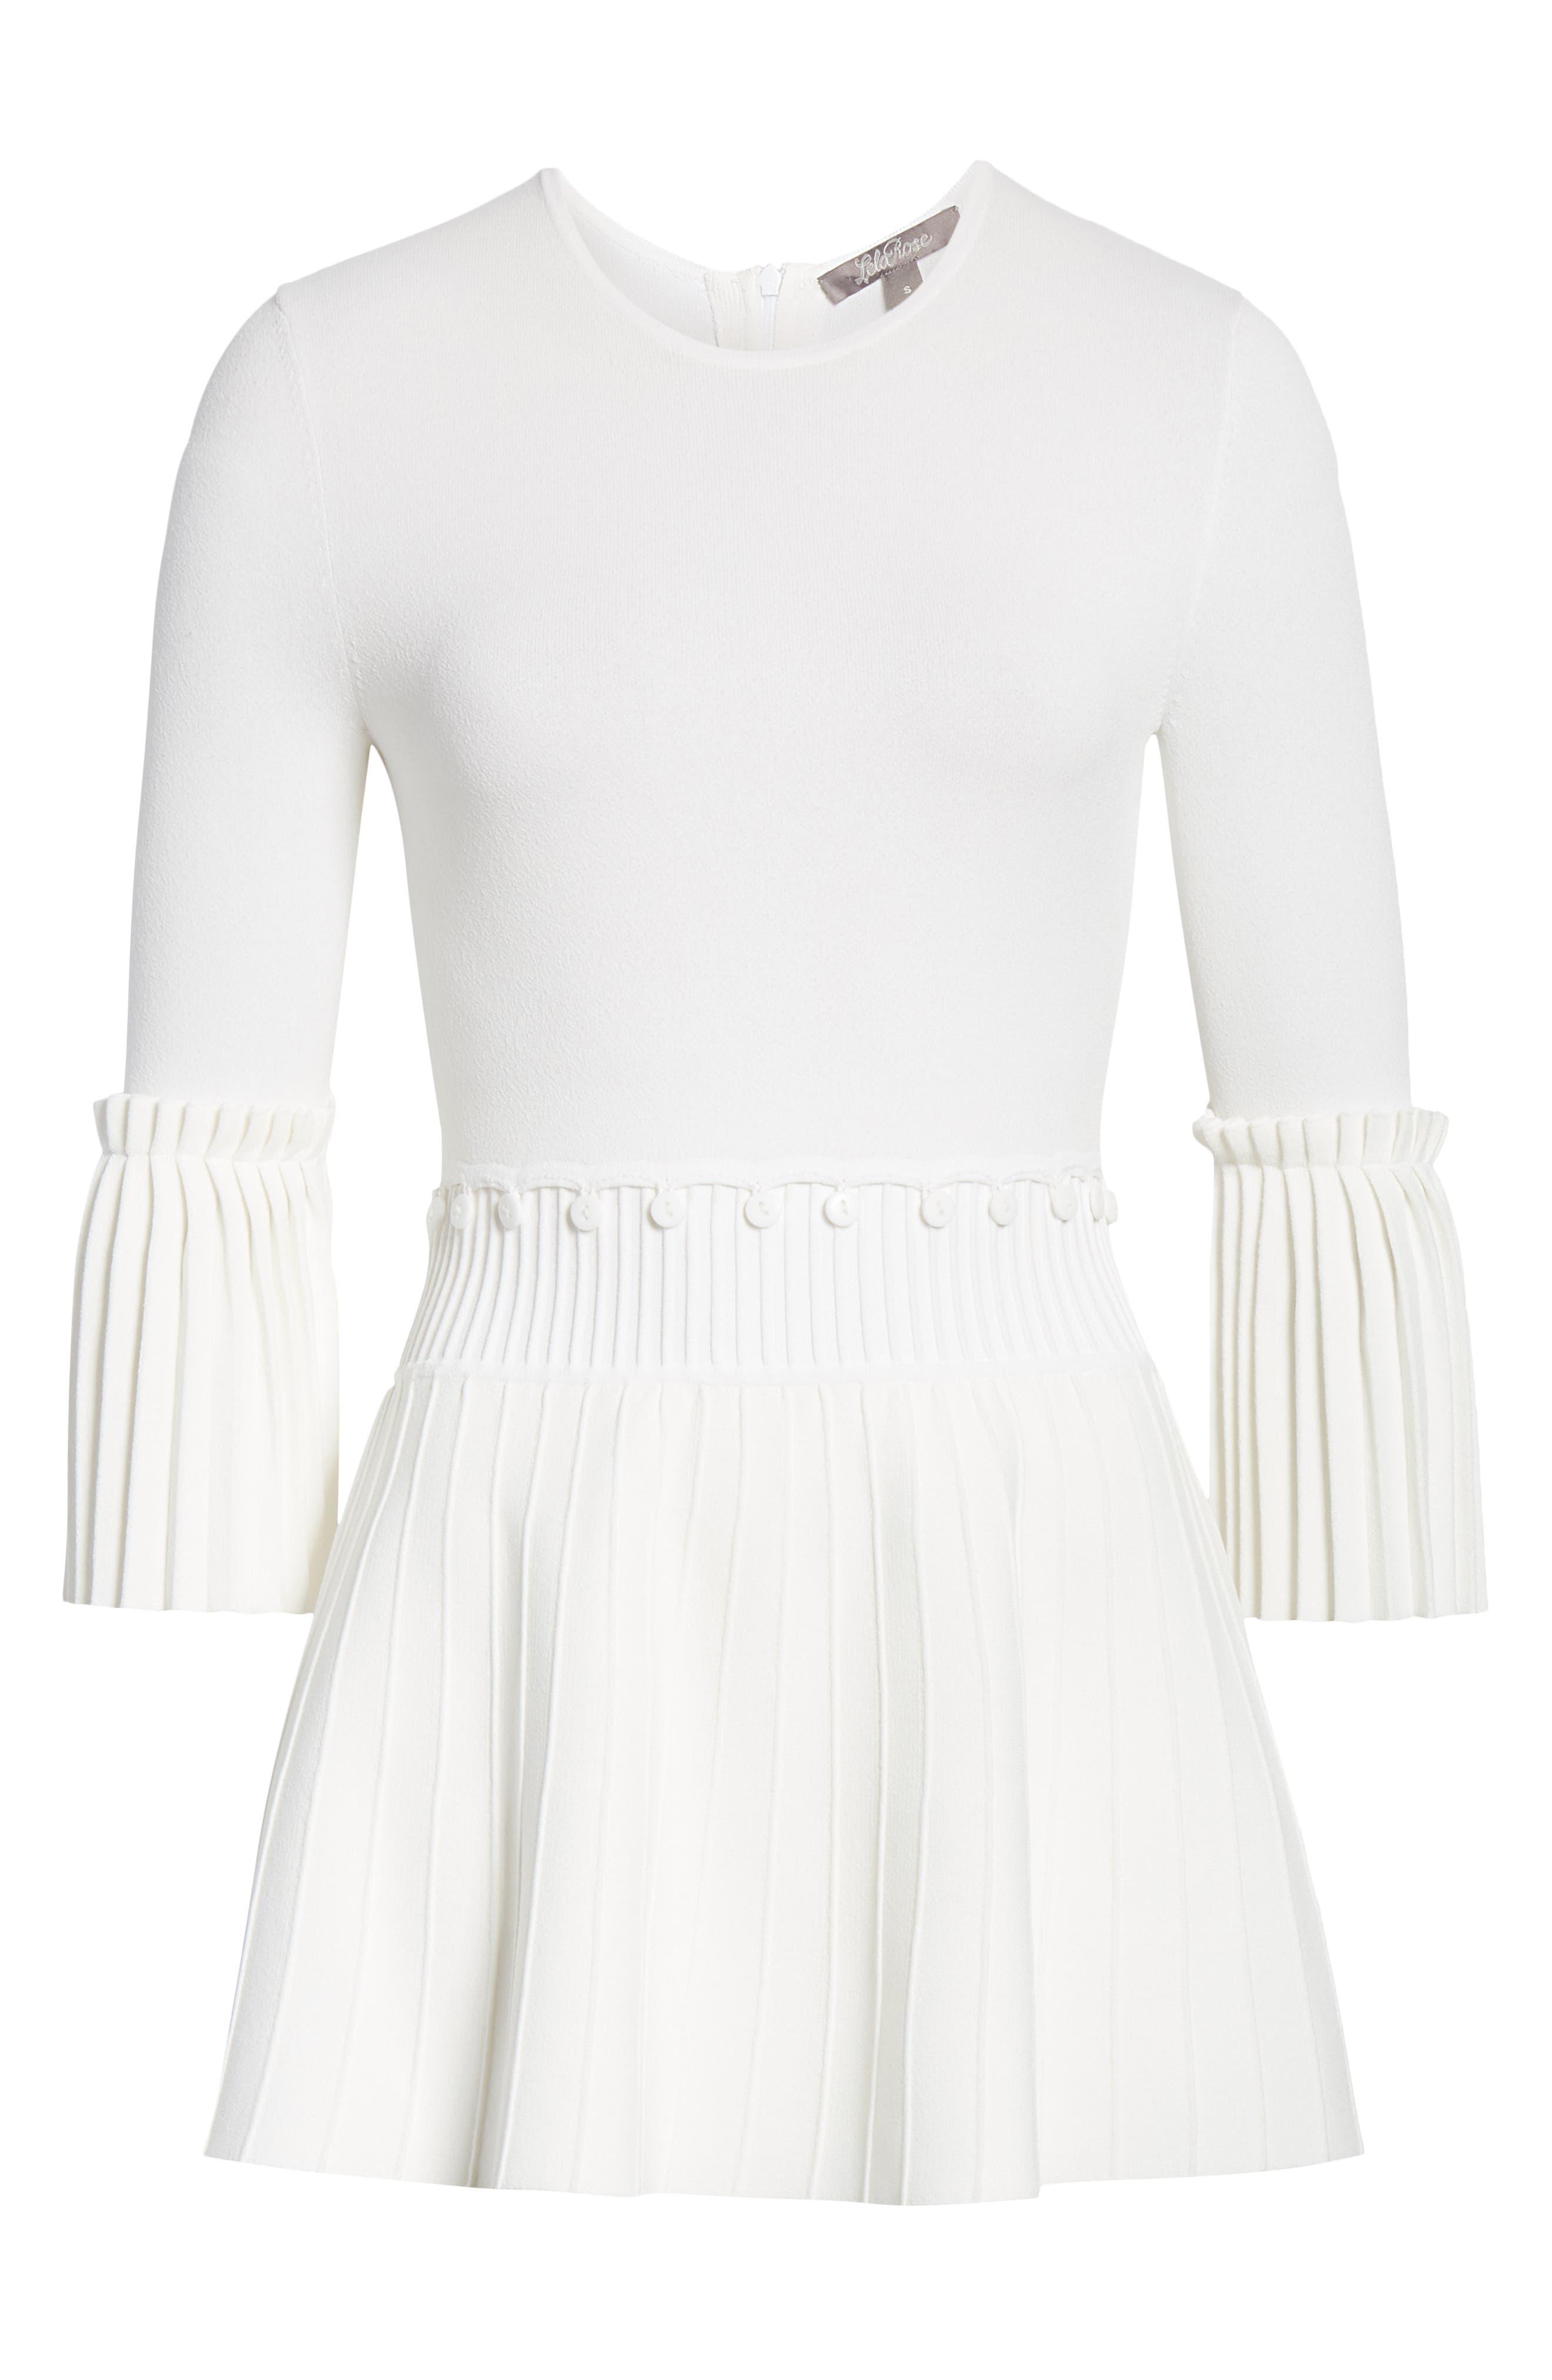 LELA ROSE,                             Pleated Knit Top,                             Alternate thumbnail 6, color,                             WHITE